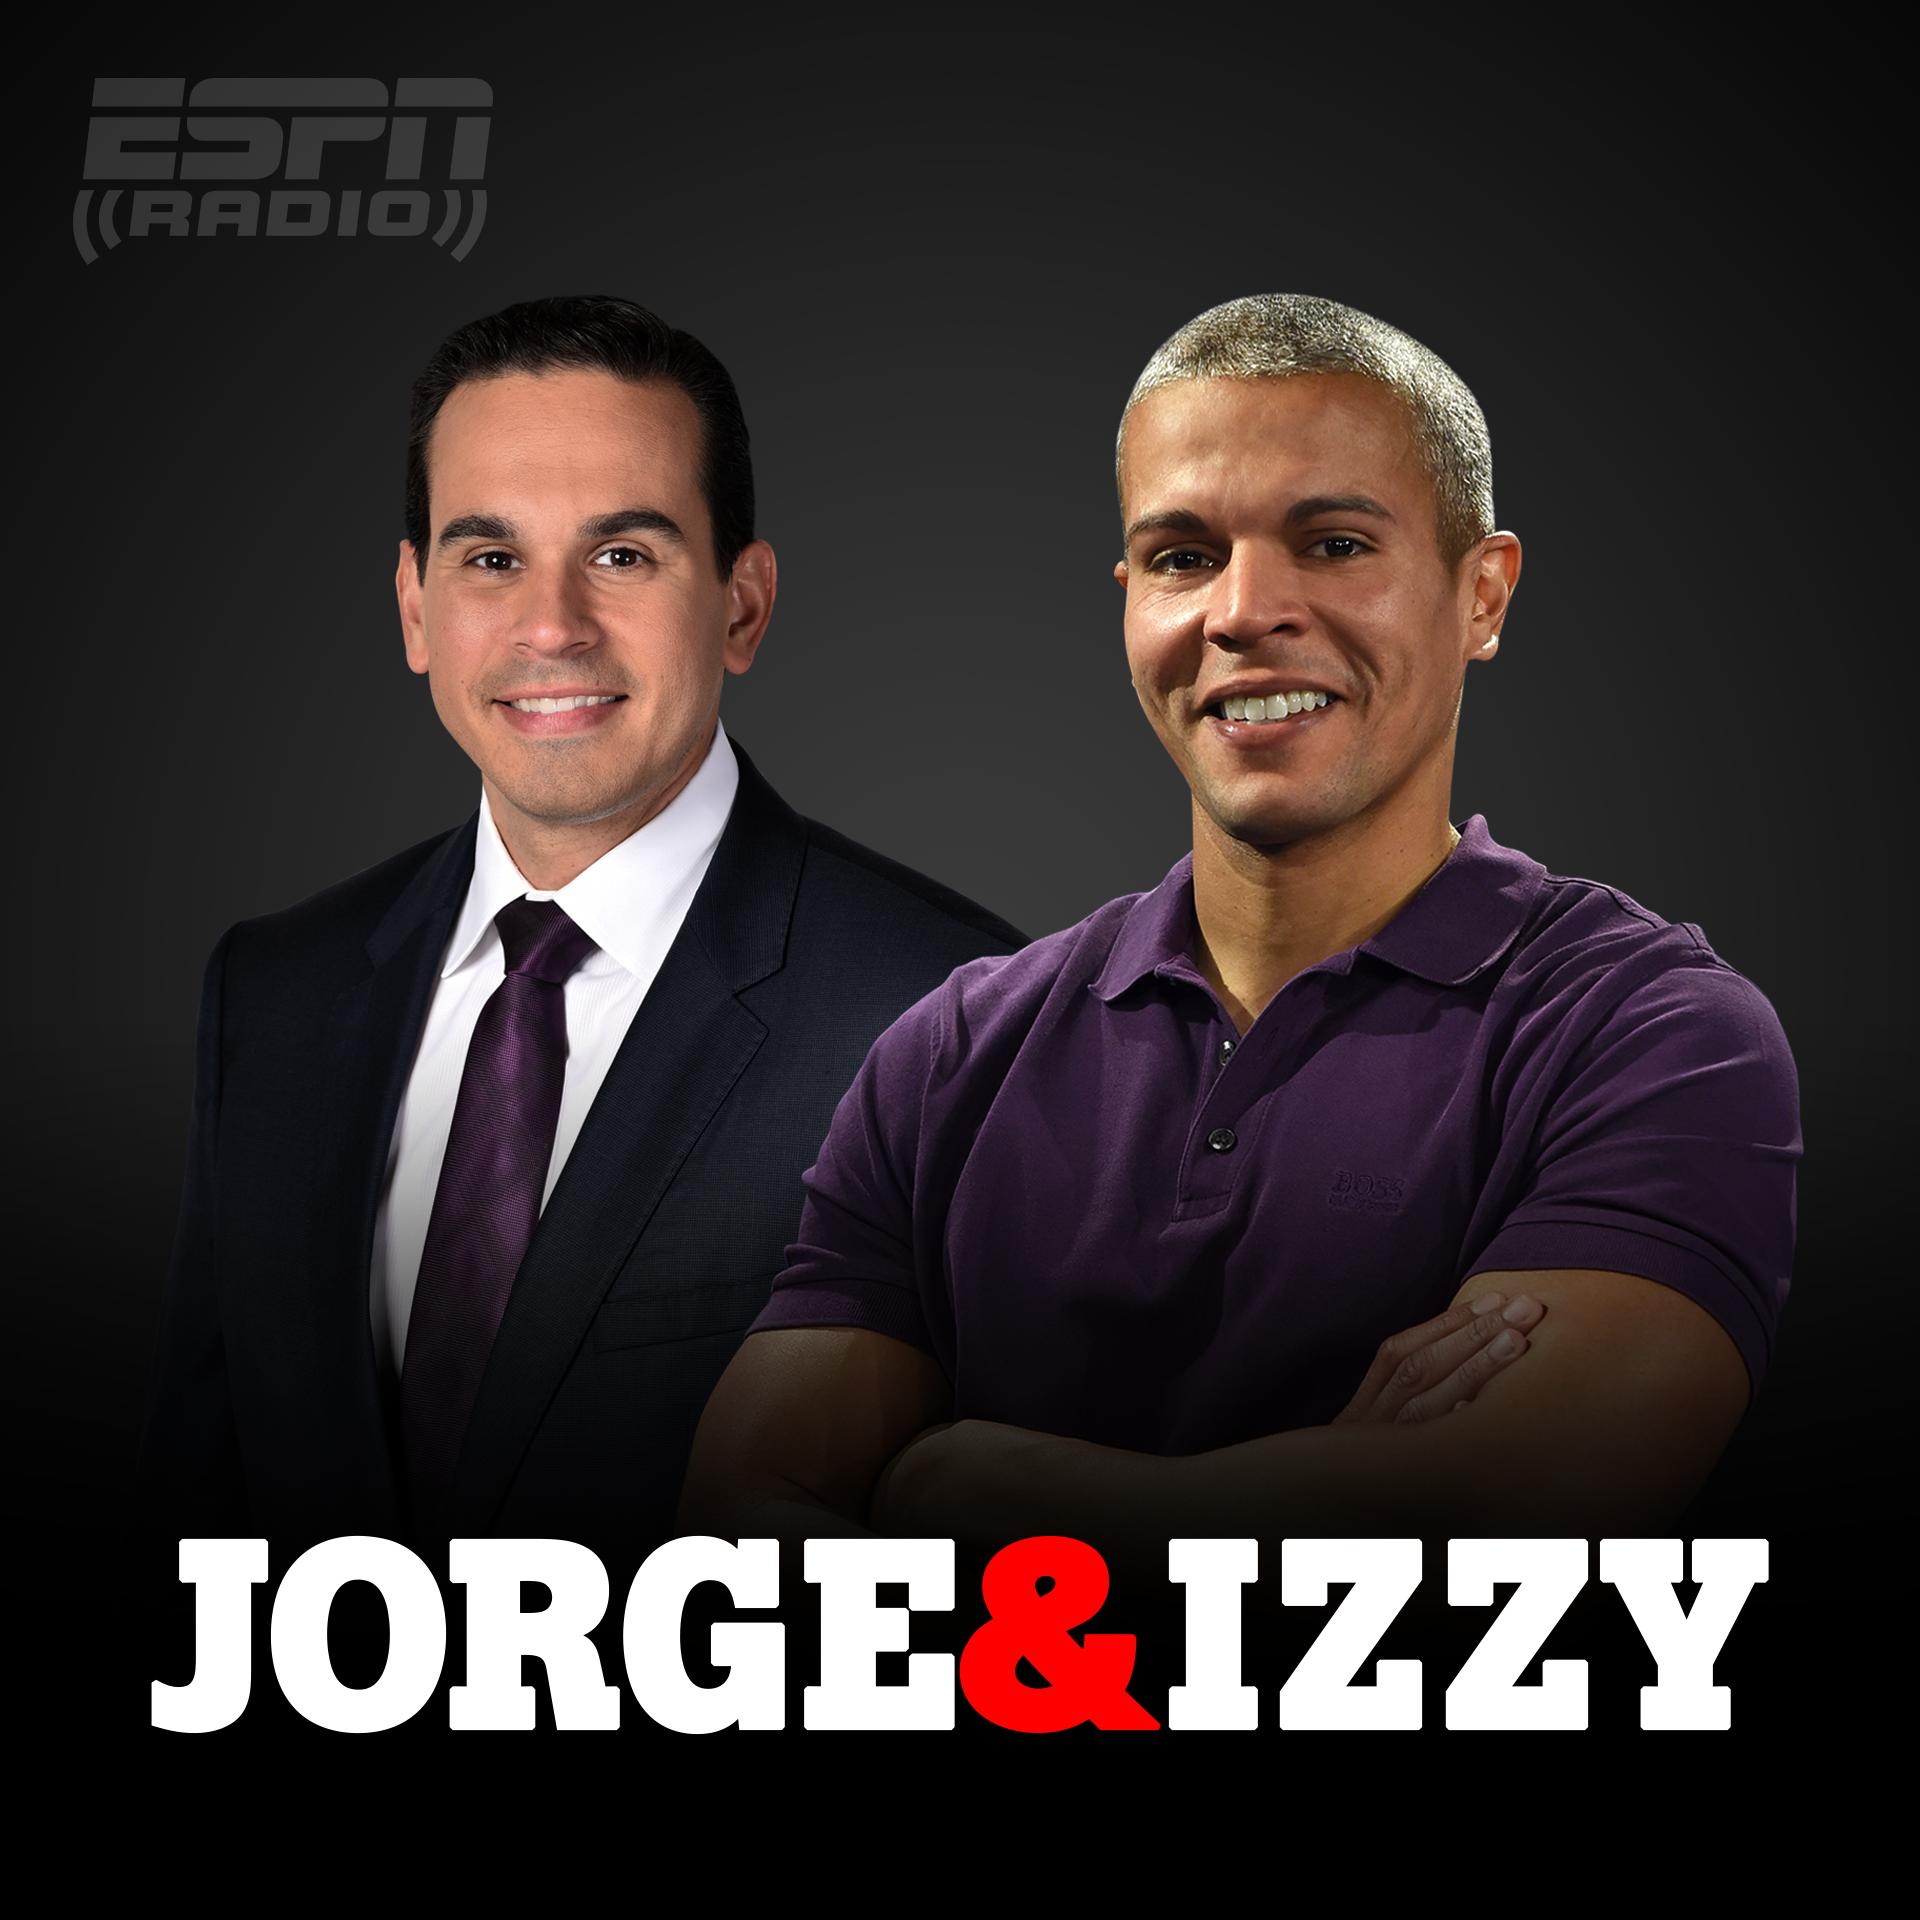 Jorge & Izzy